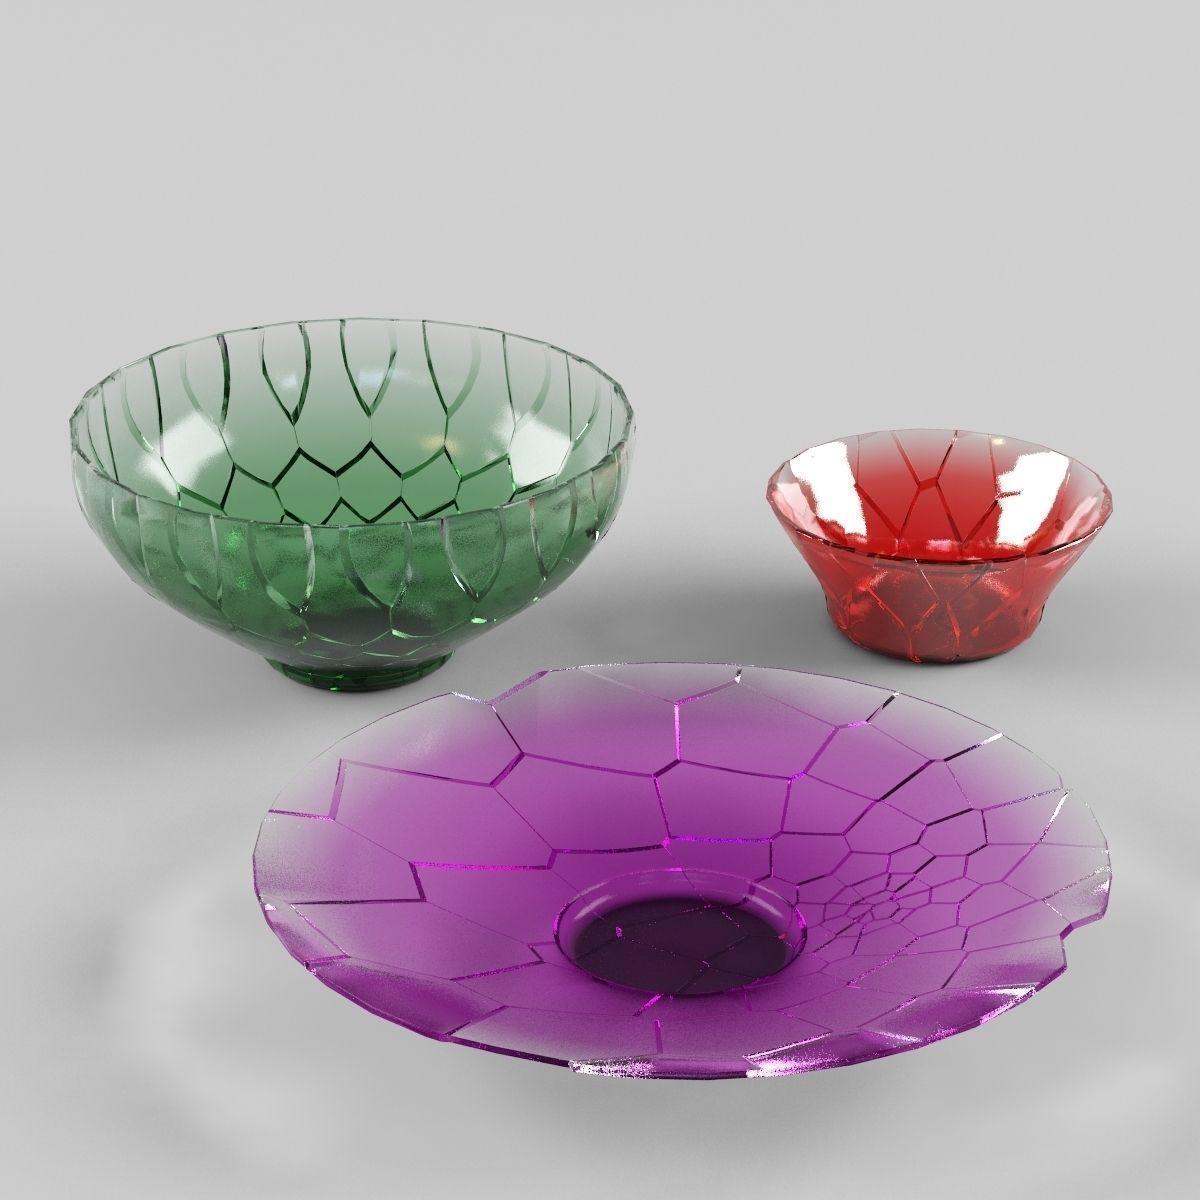 Broken Vases 3D Model .fbx